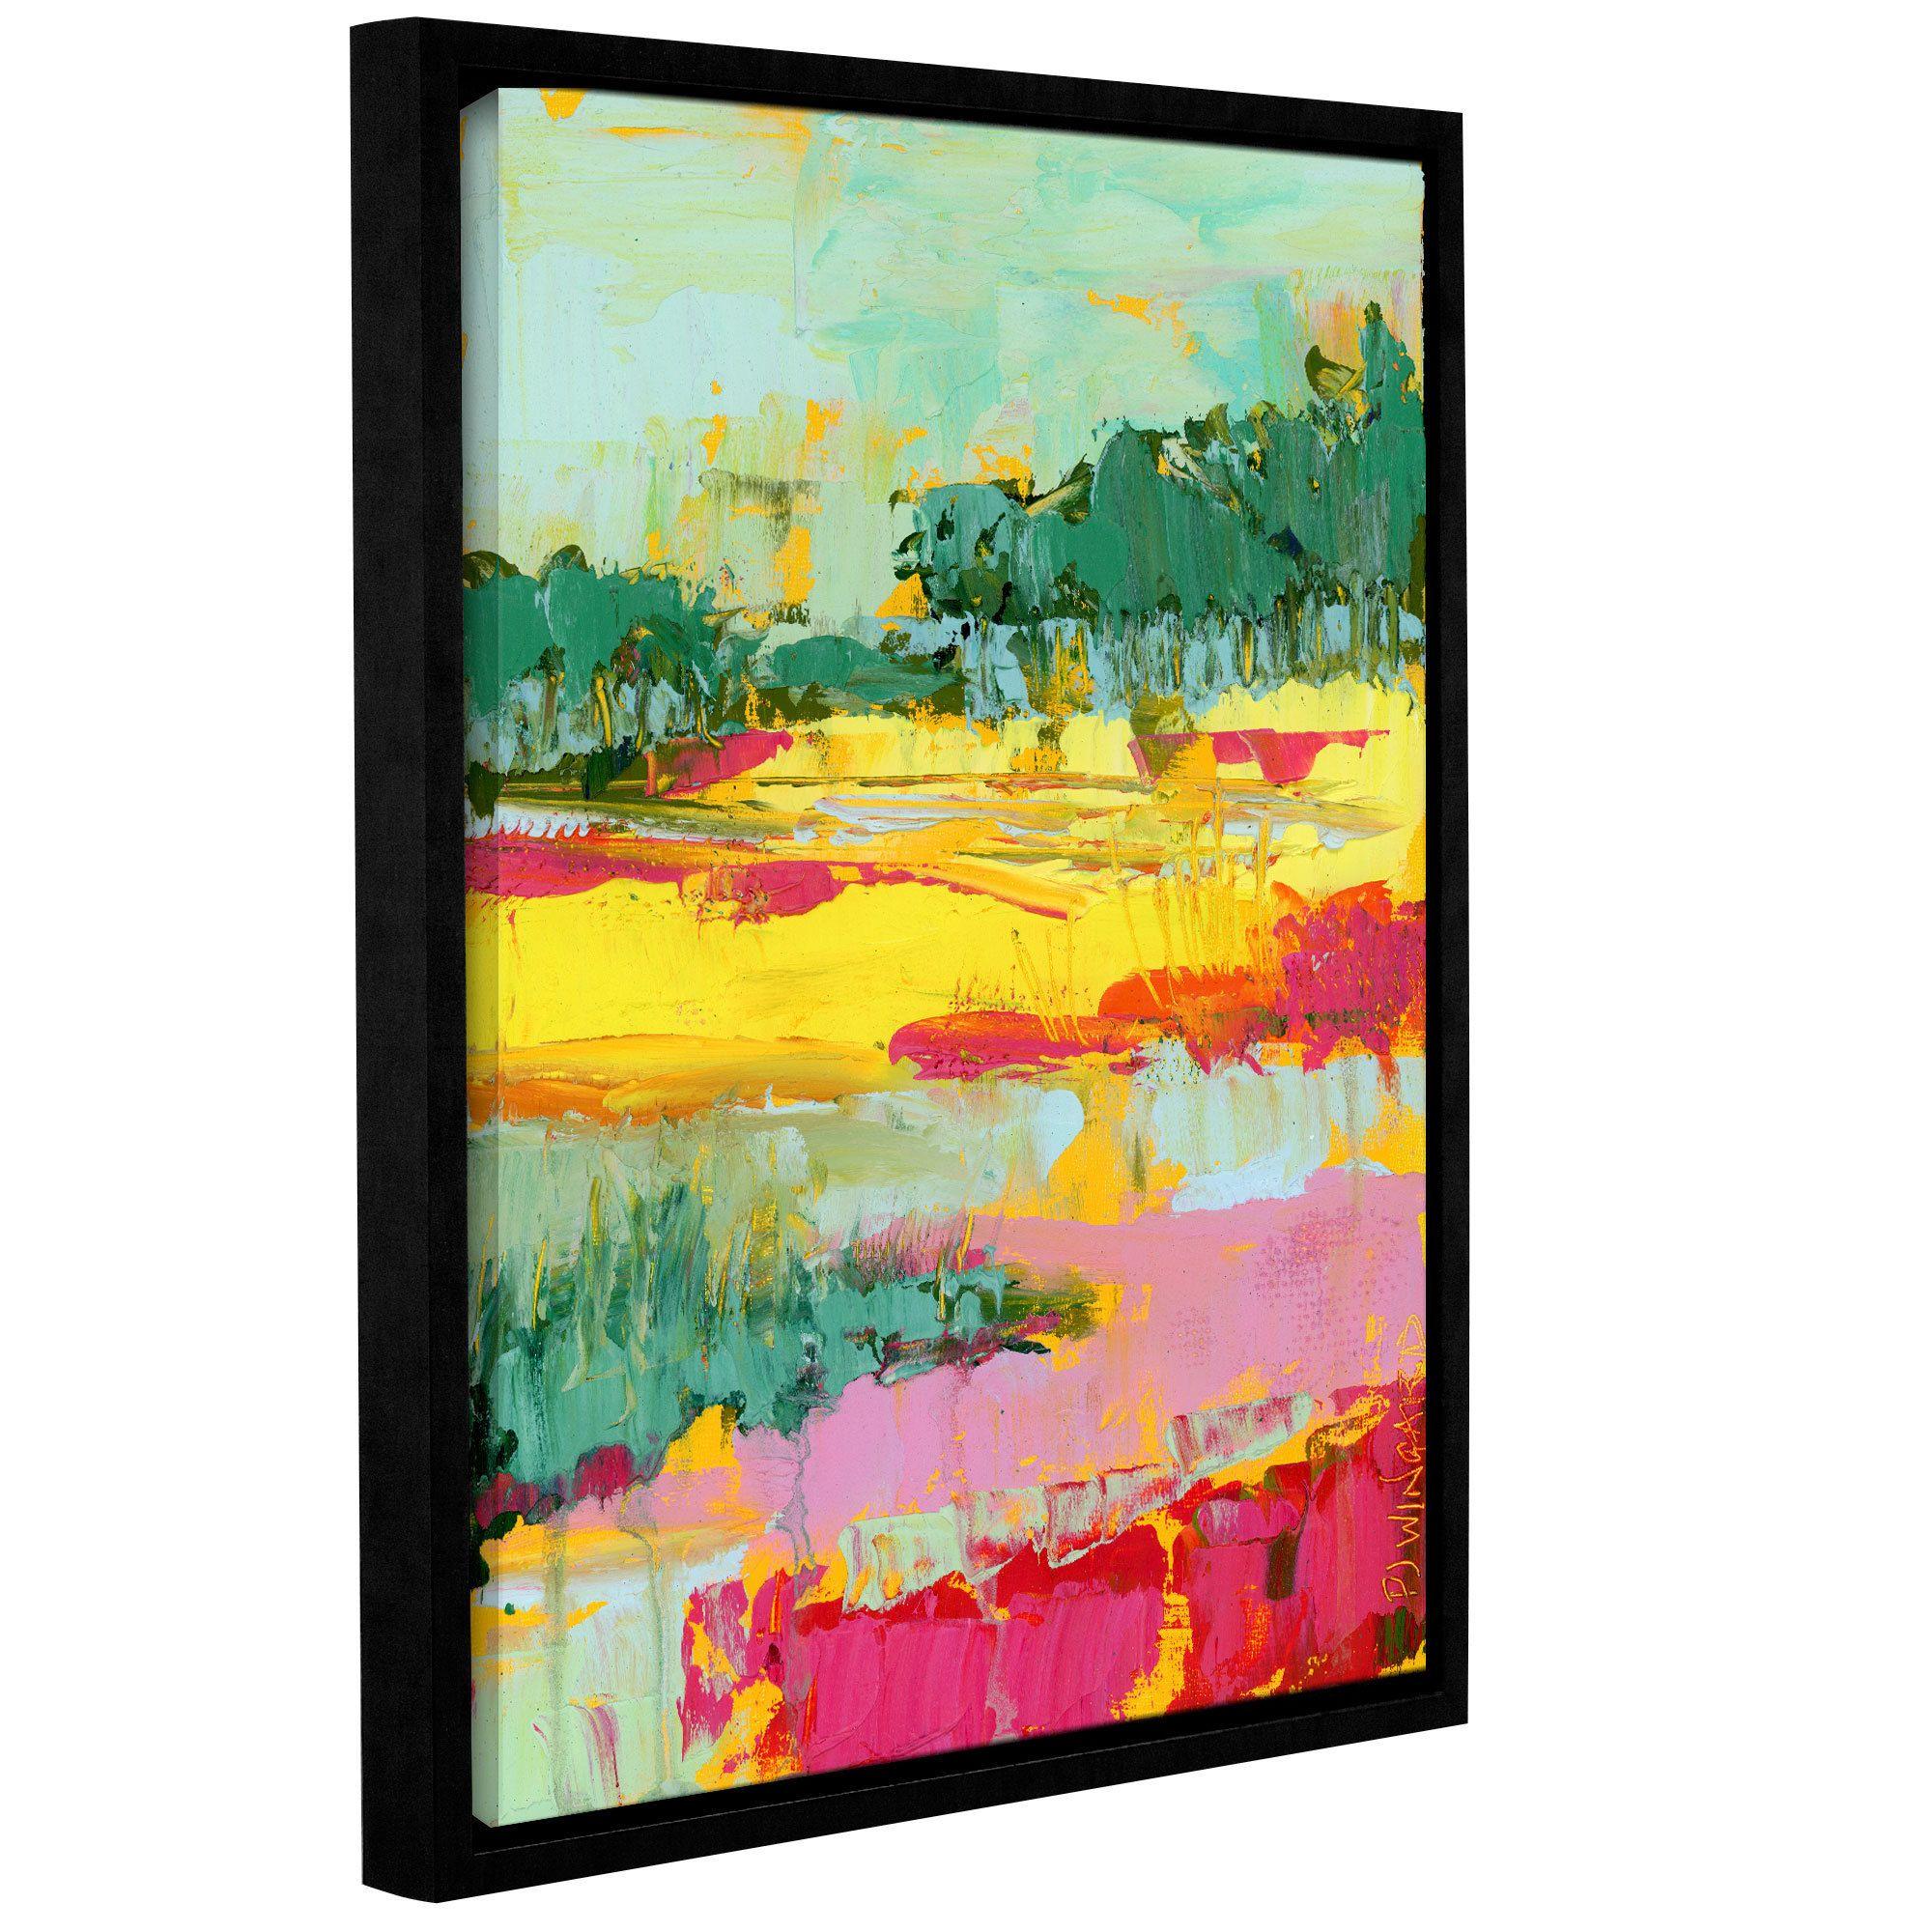 ArtWall Pamela J. Wingard's 'Abstract